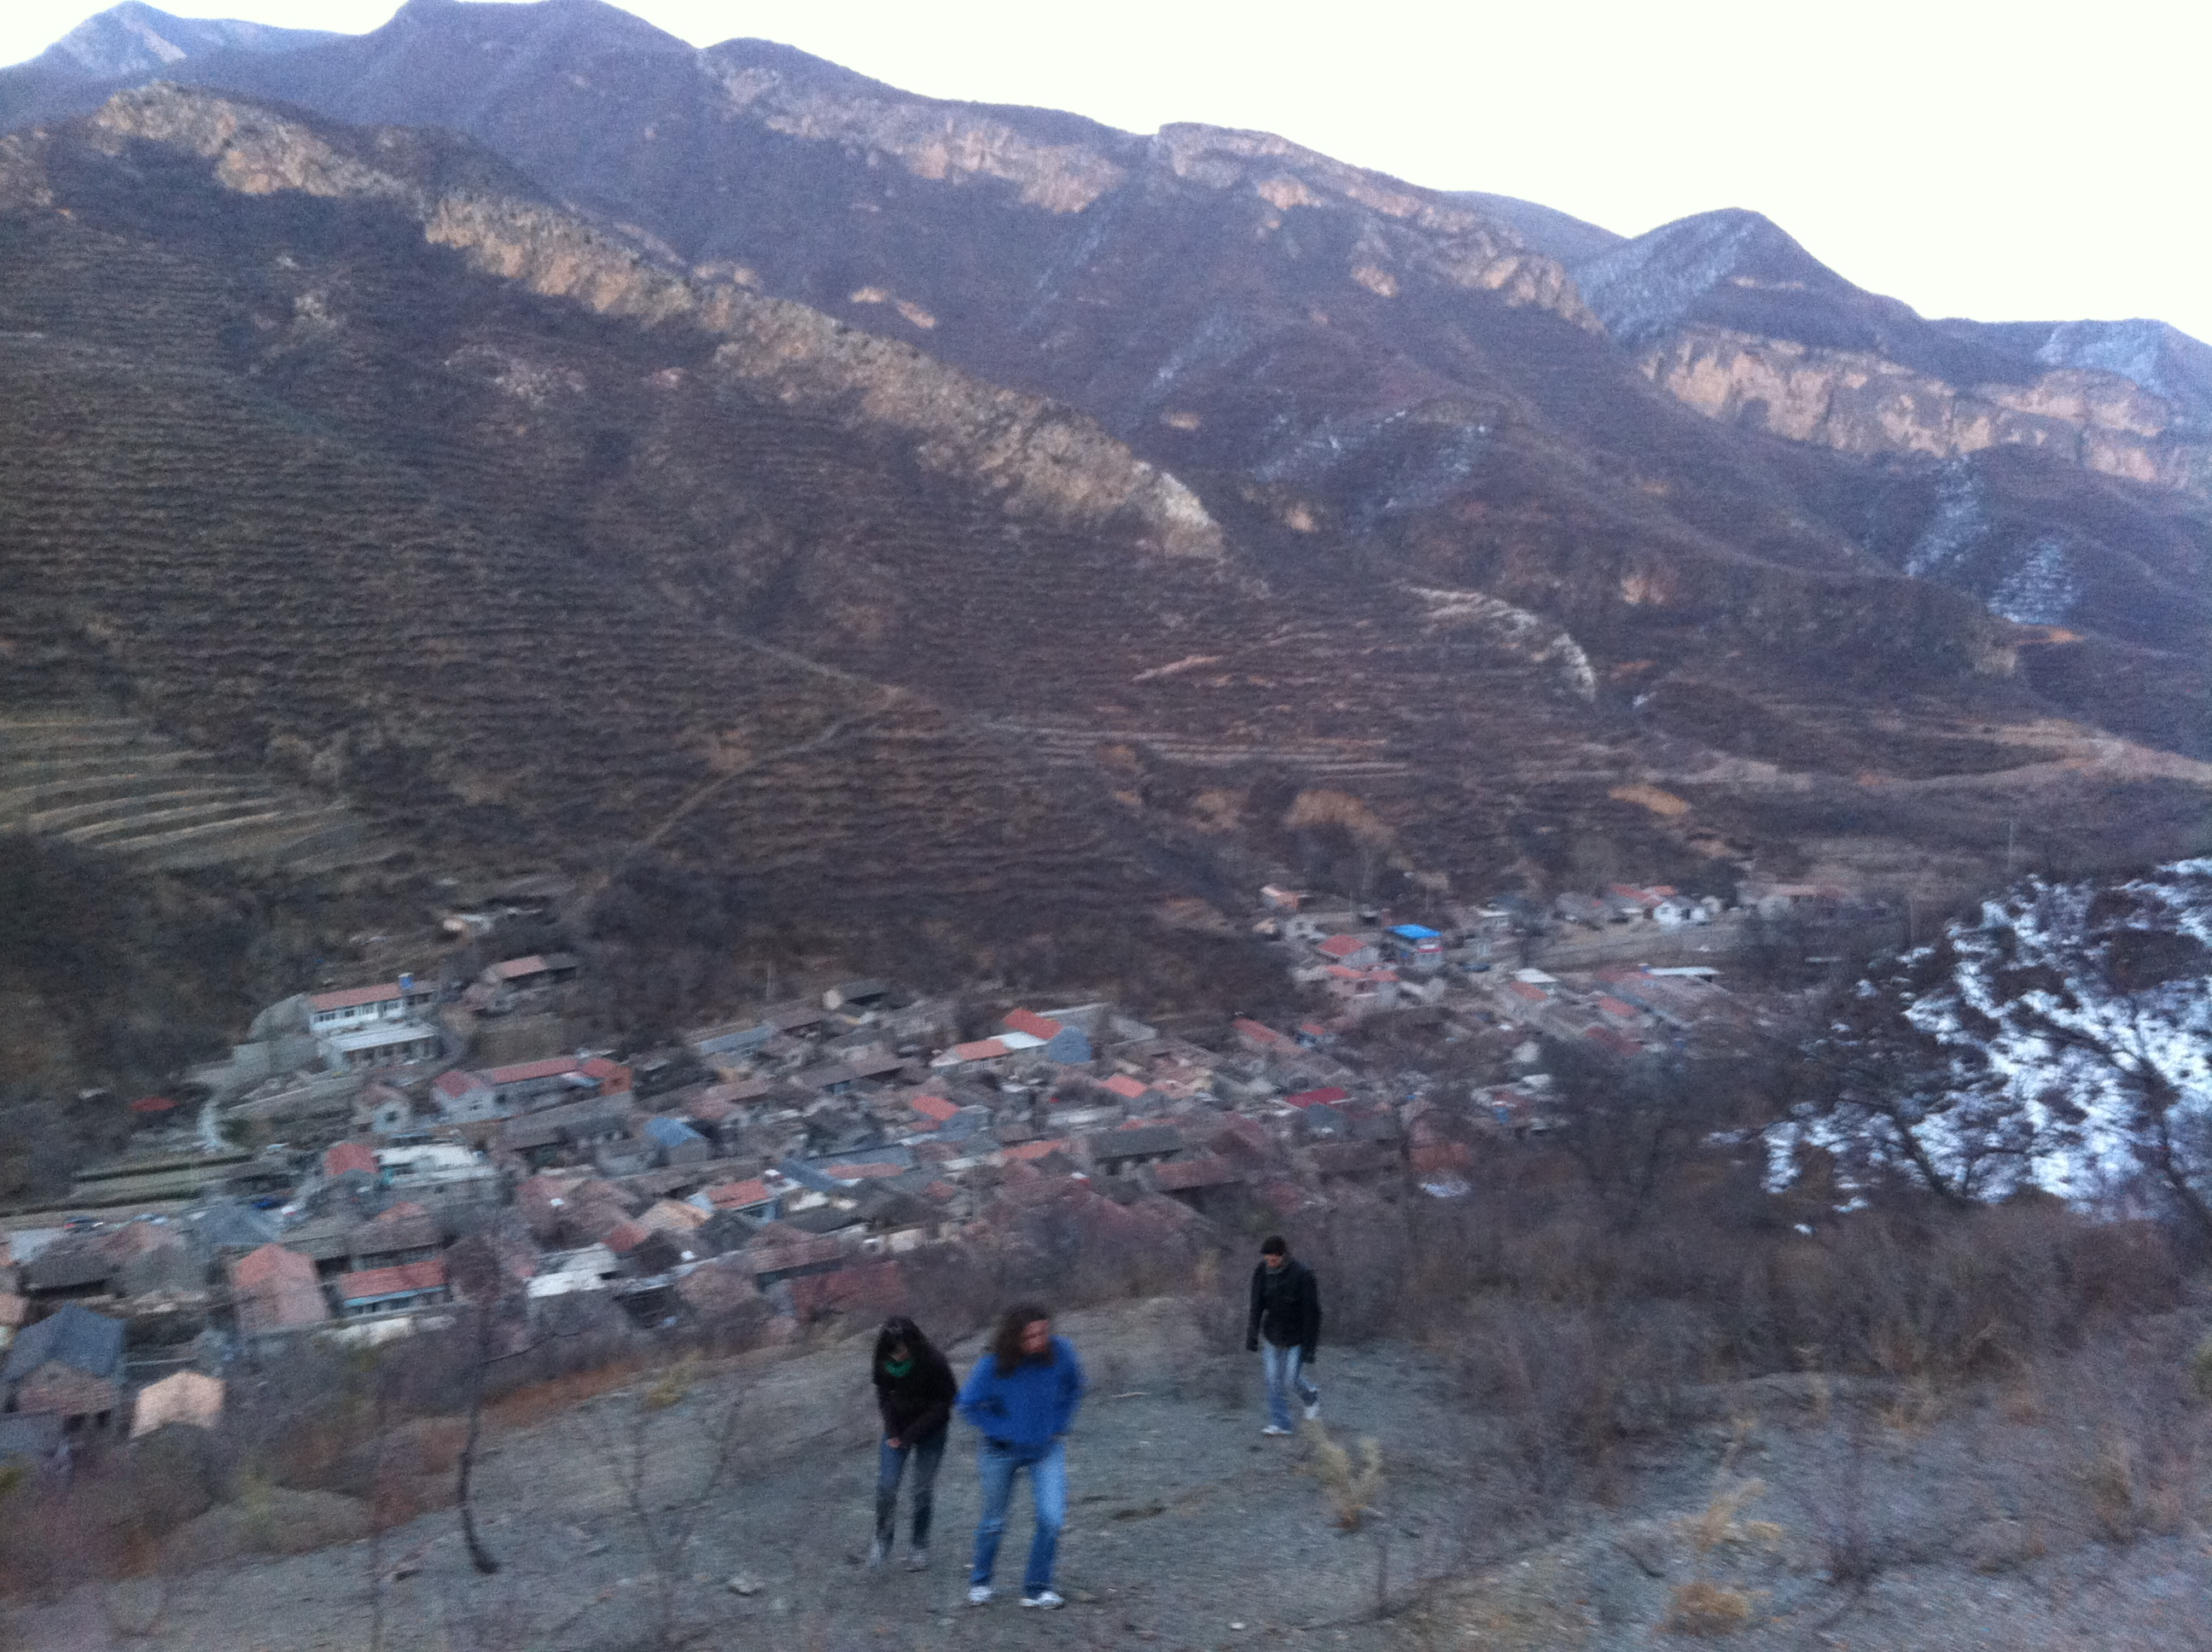 Hiking up the Mountain Near Cuandixia